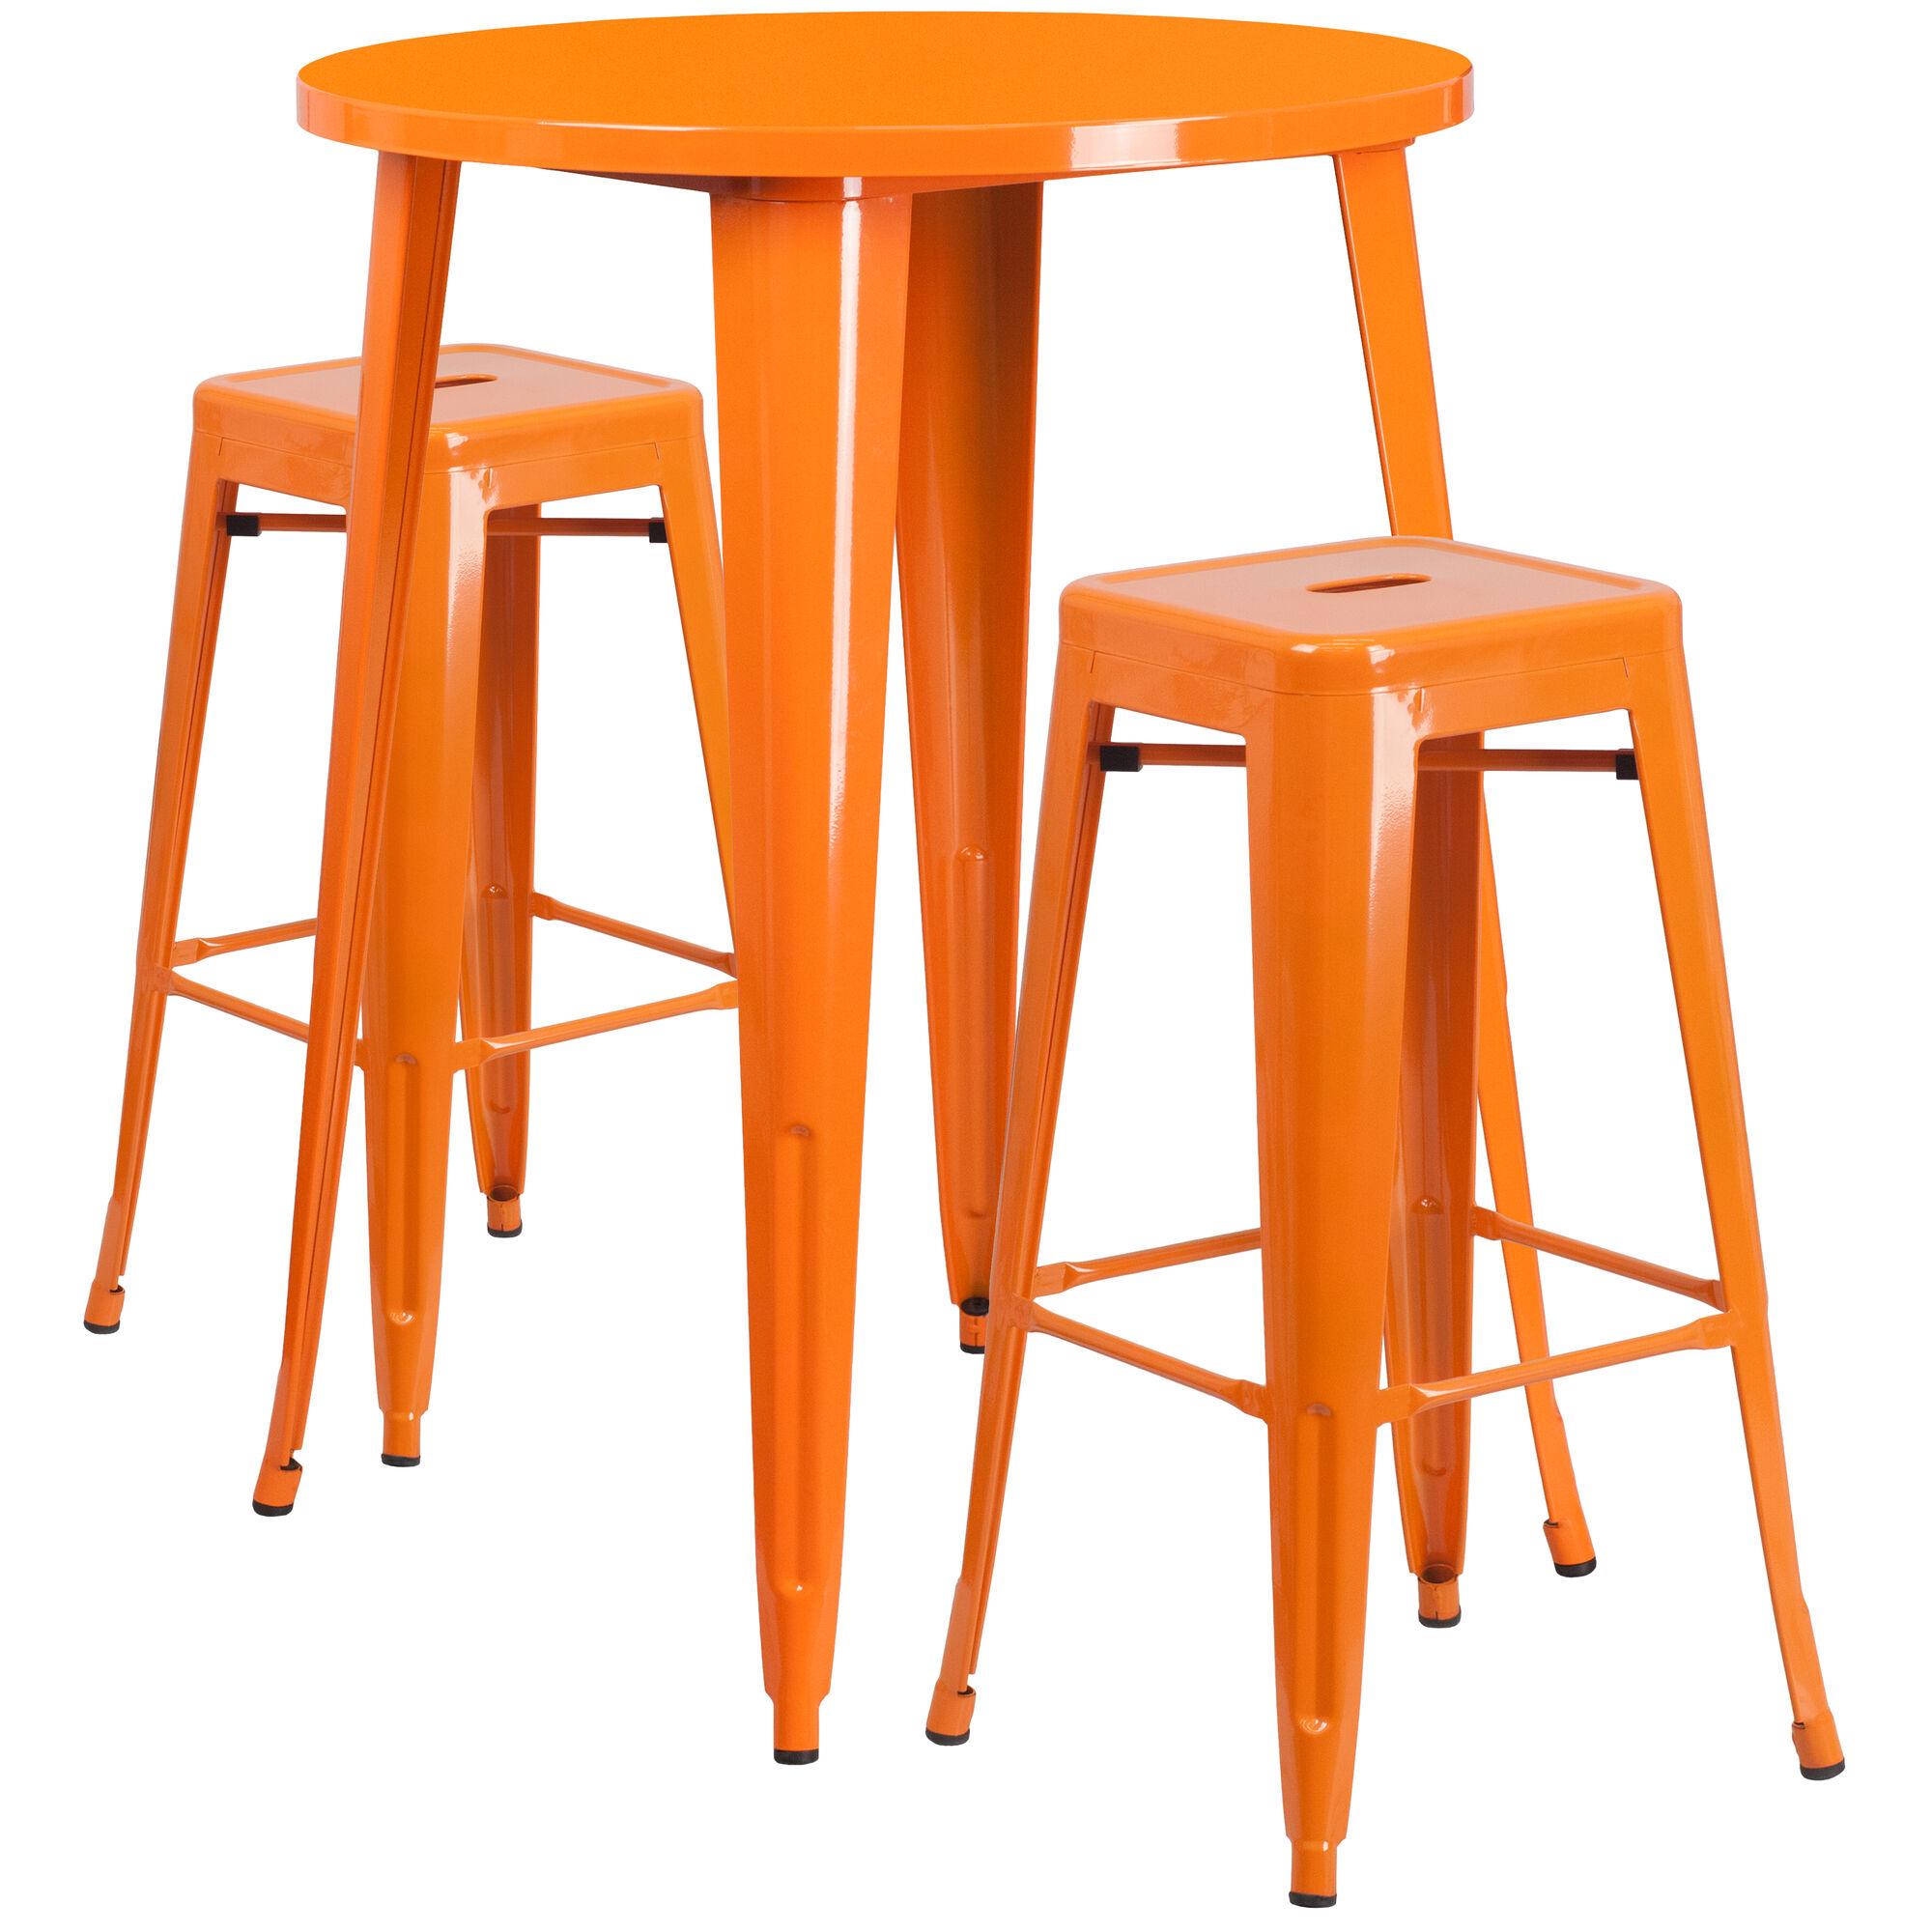 30rd Orange Metal Bar Set Ch 51090bh 2 30sqst Or Gg